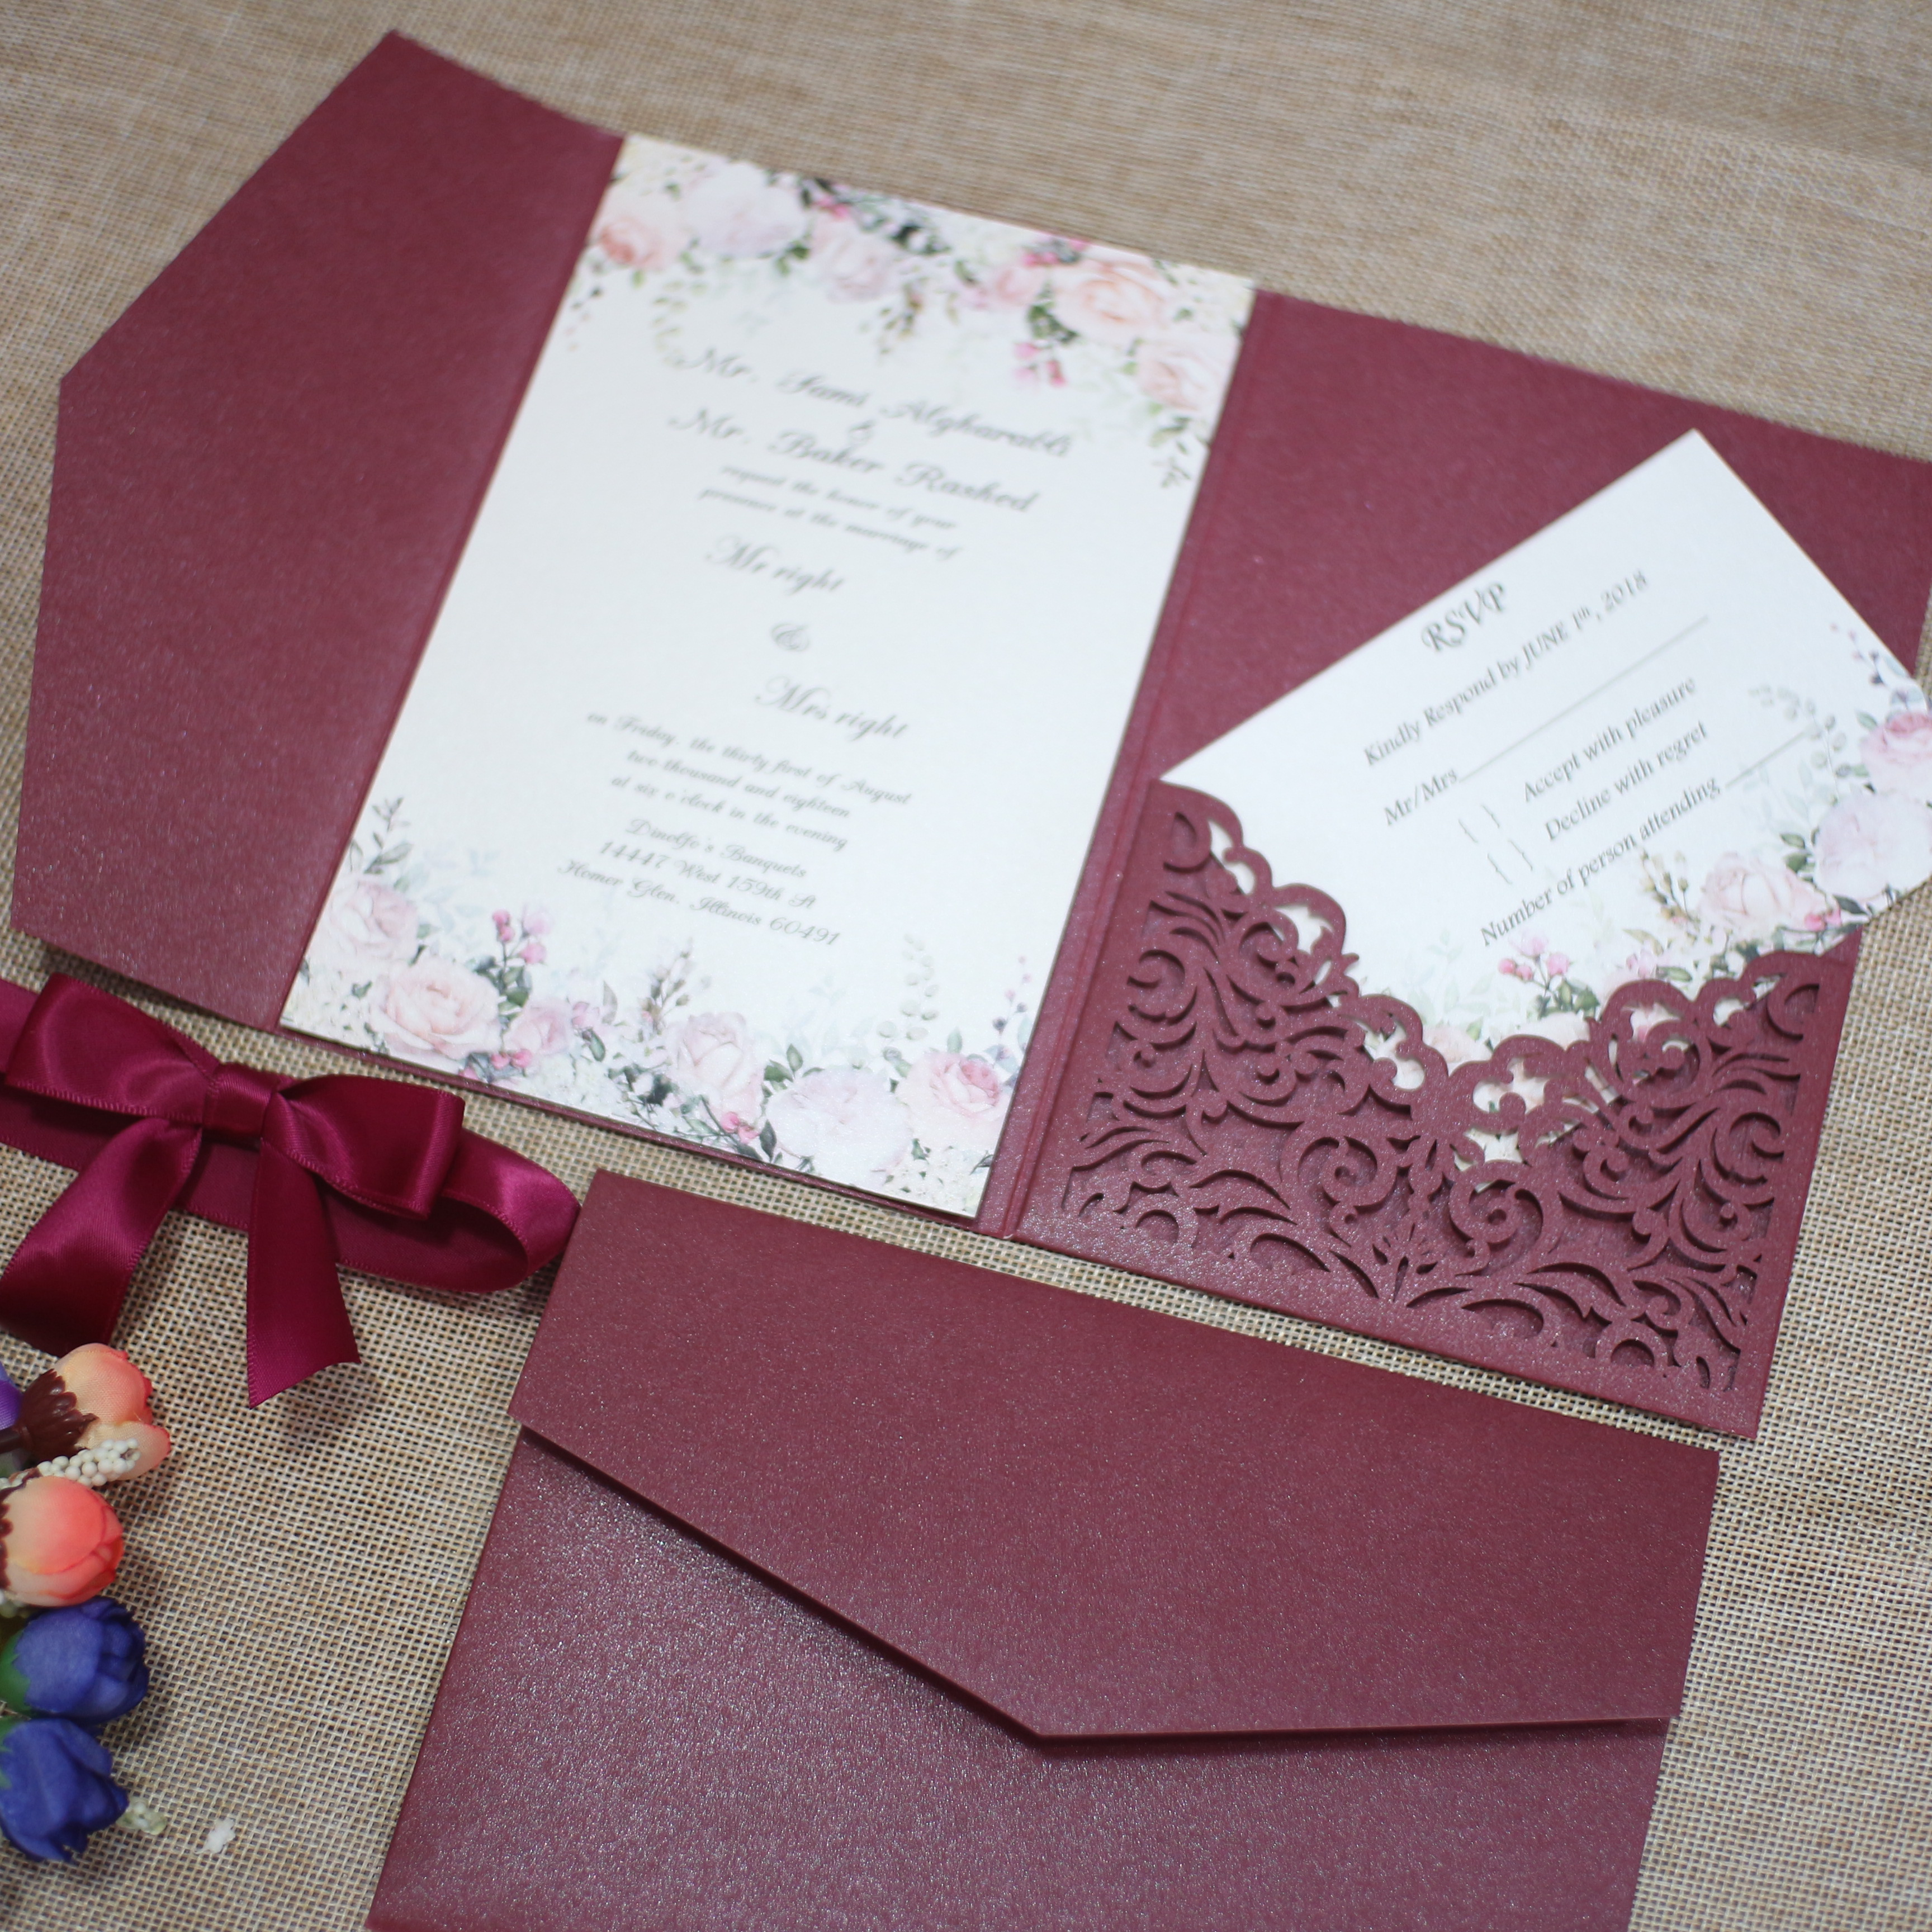 free shipping 2pcs Vine tri fold wedding invitation cards with envelope , insert, RSVP 3 fold laser cut pocket fold cards|Cards & Invitations| -  AliExpress